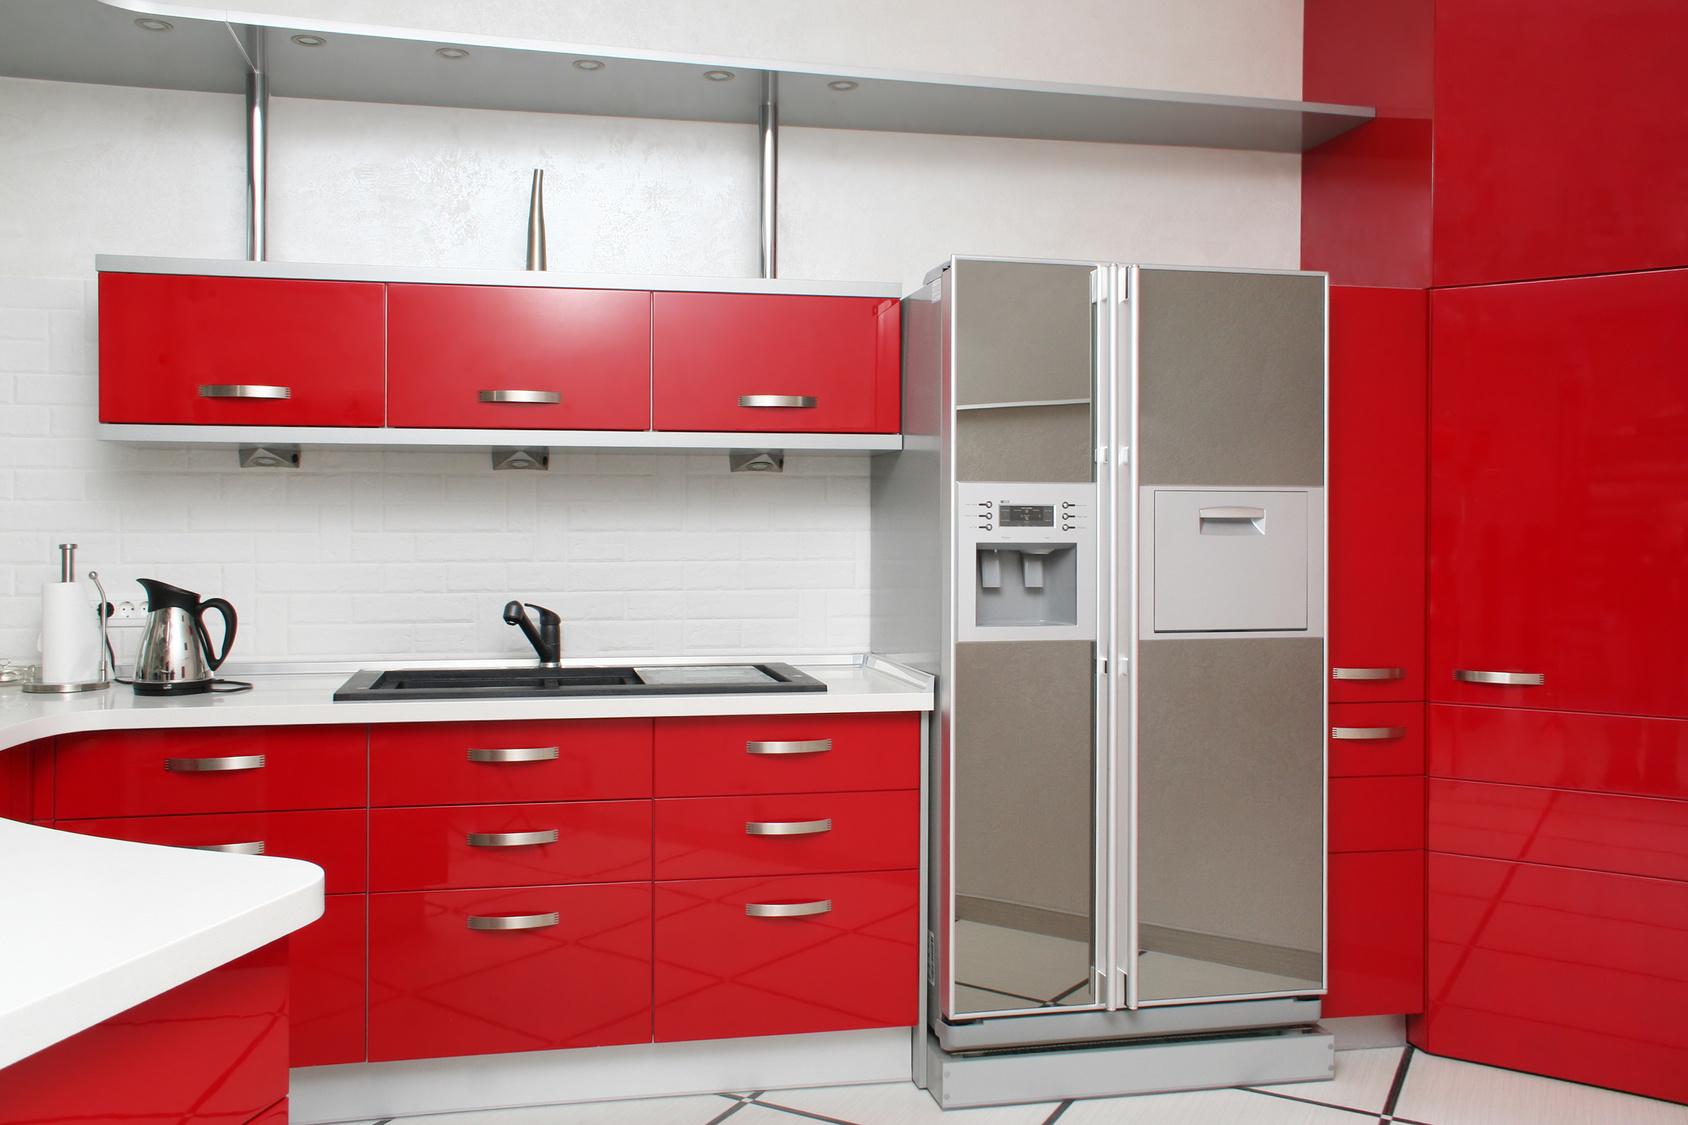 Küchenwaage Poco ~  , pinke küchenwaage, pinke küchenhelfer, pinke küche poco domäne